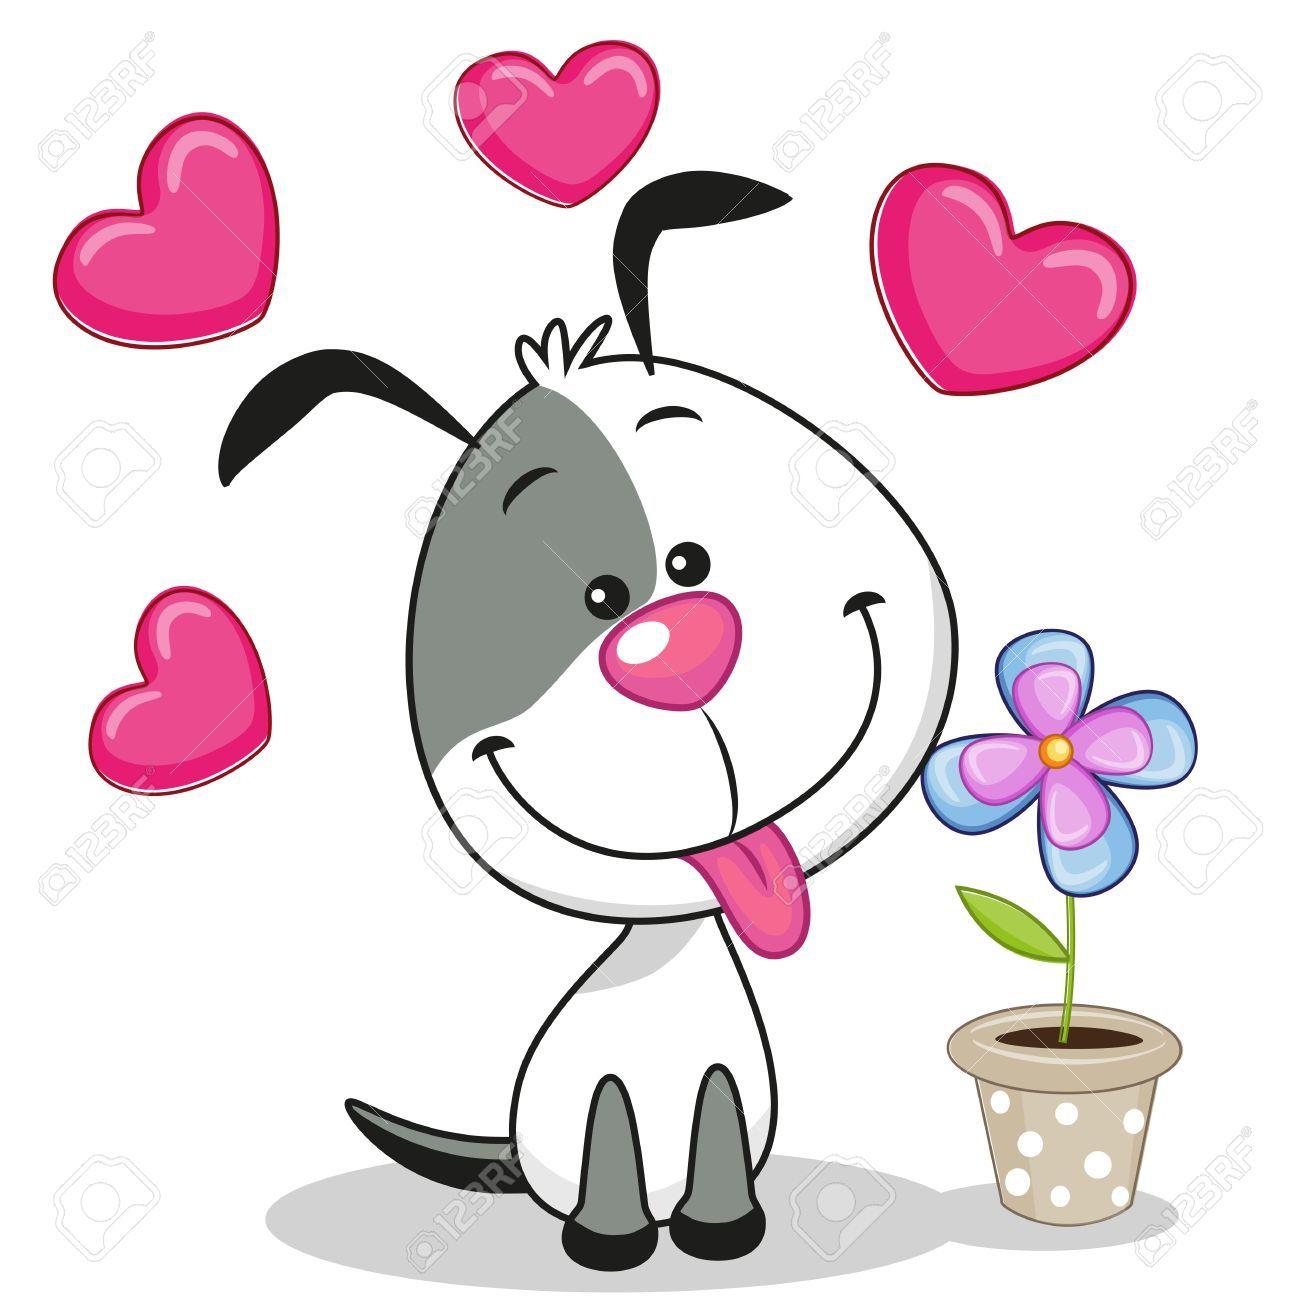 Greeting Card Dog With Heart And Flower Illustration Sponsored Dog Card Greeting Illustration F Schattige Tekeningen Schattige Kunst Kaartje Maken